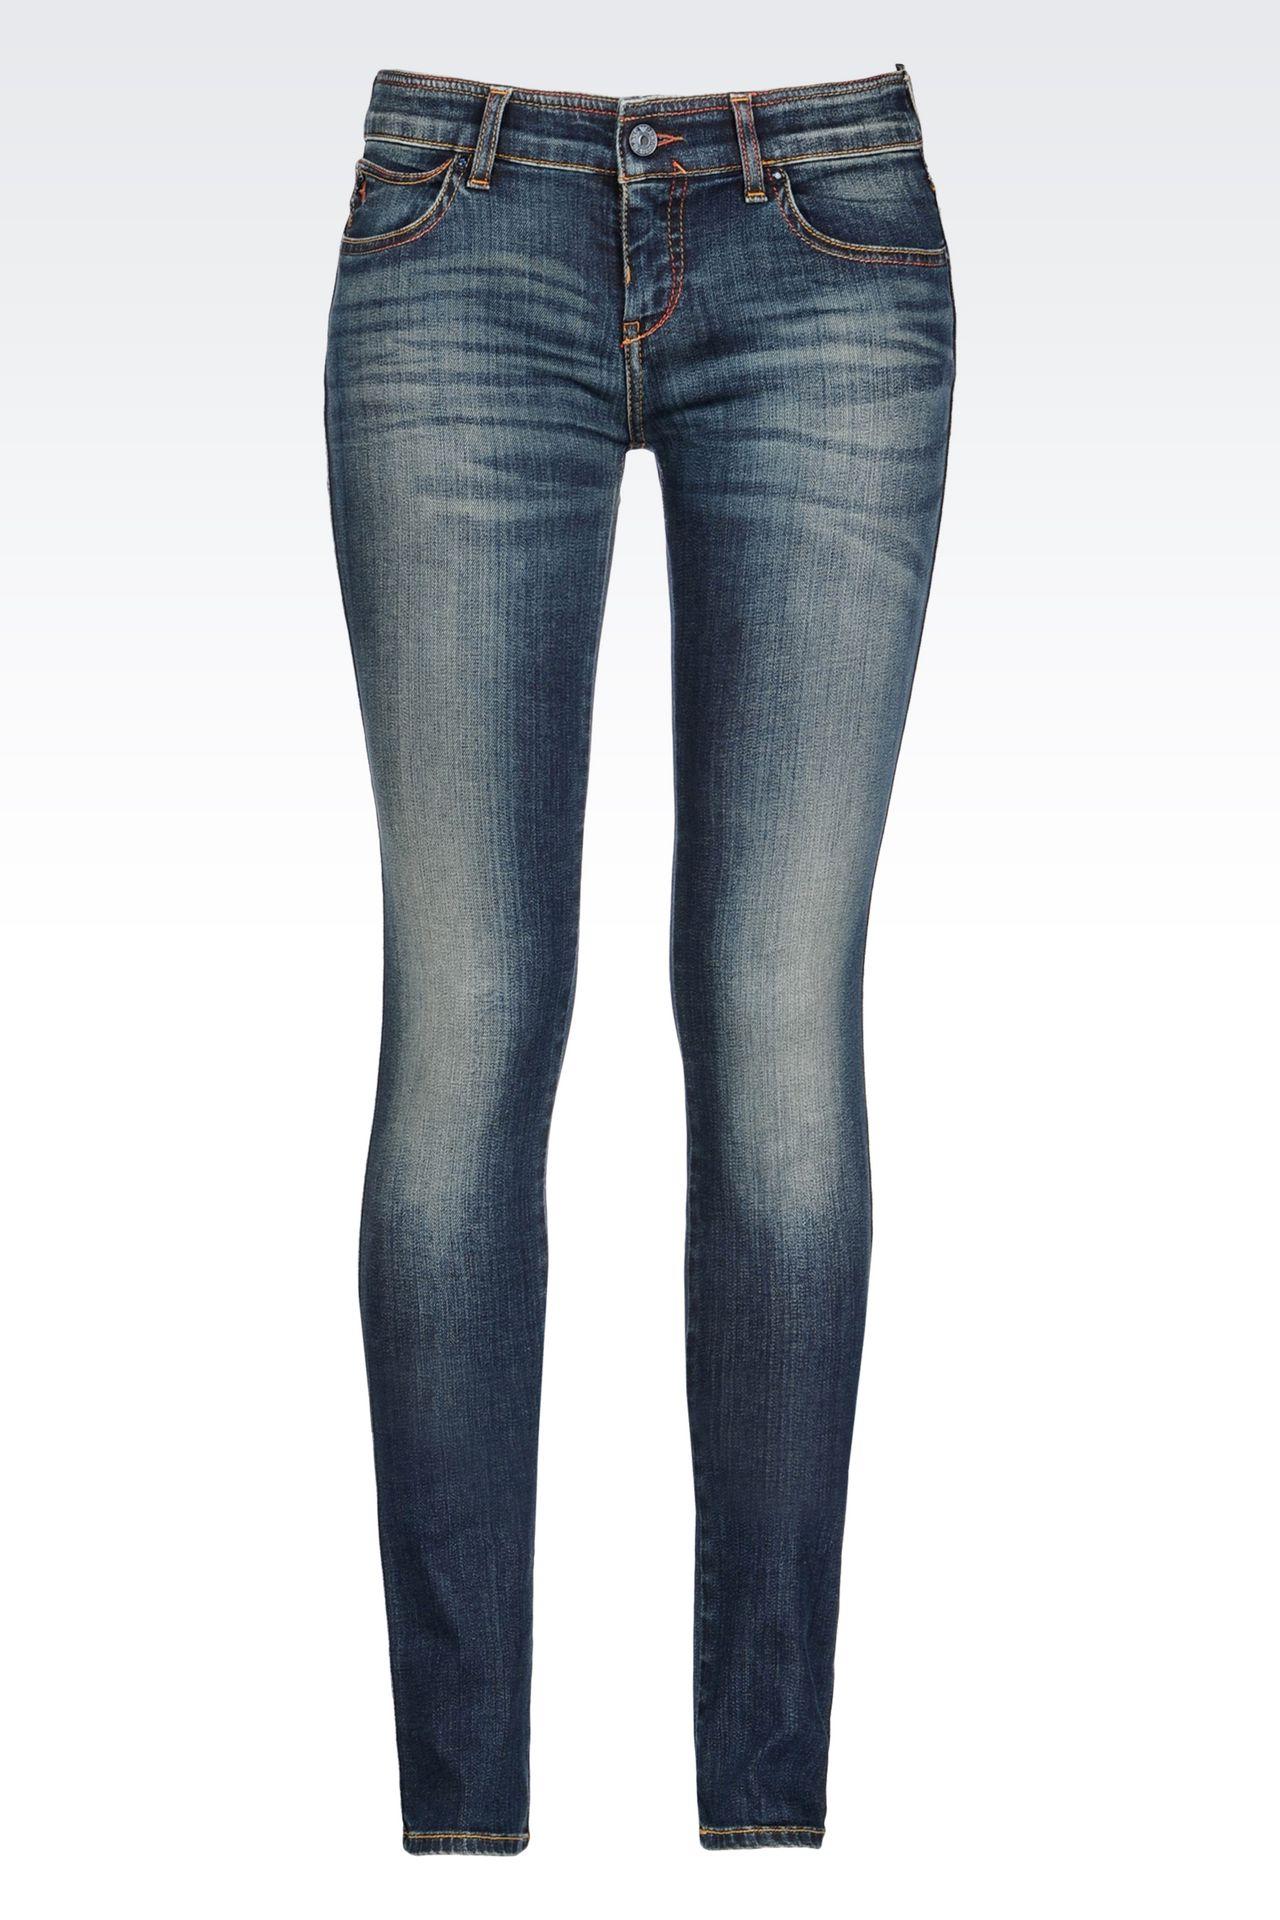 SUPER STRETCH VINTAGE MEDIUM DARK WASH JEANS: Jeans Women by Armani - 0